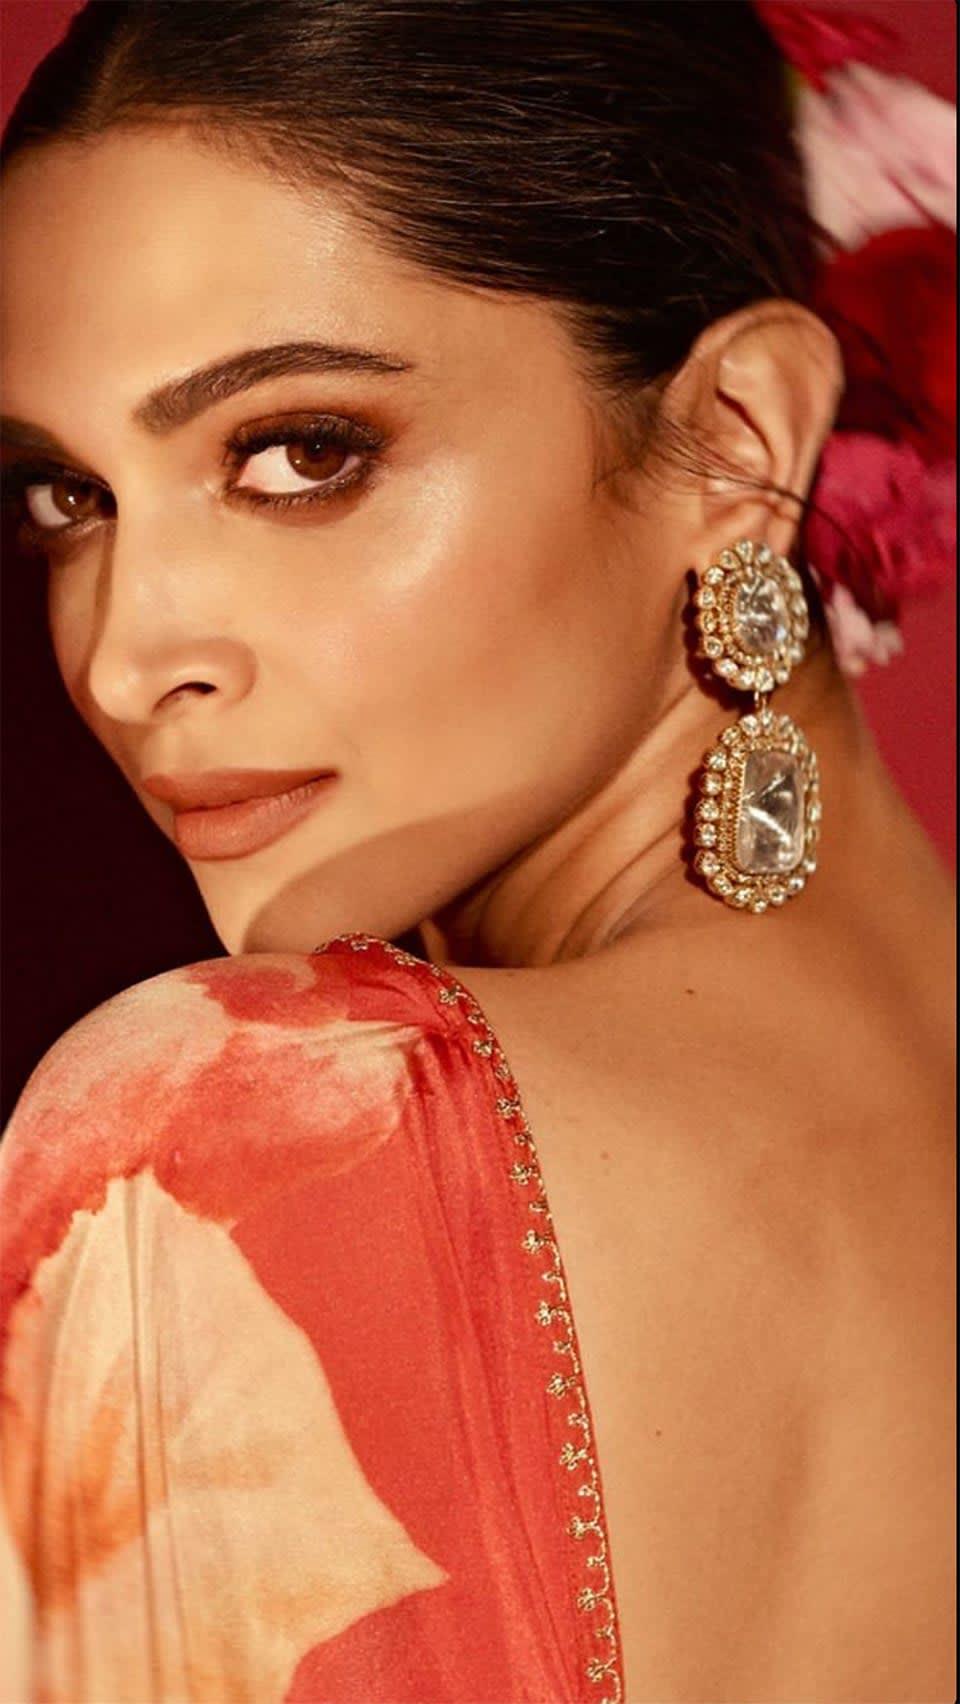 Dazzlerr: Deepika Padukone Stuns in a Floral Red Saree at Lokmat Most Stylish Awards 2019